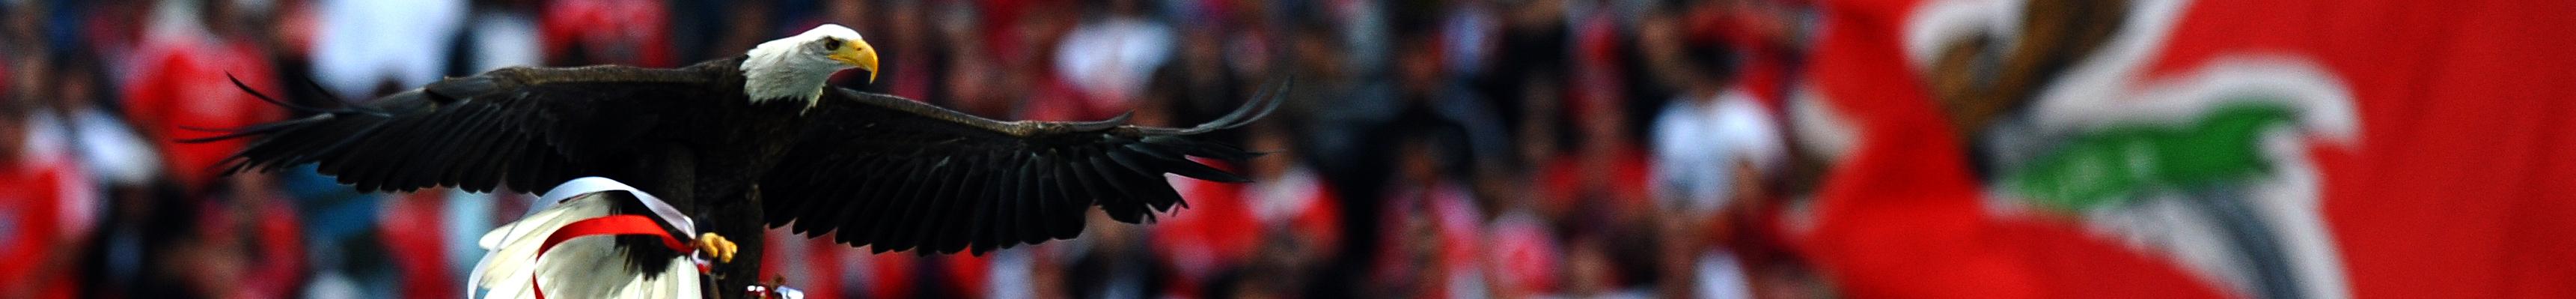 Benfica-Eintracht, quale aquila volerà più in alto?